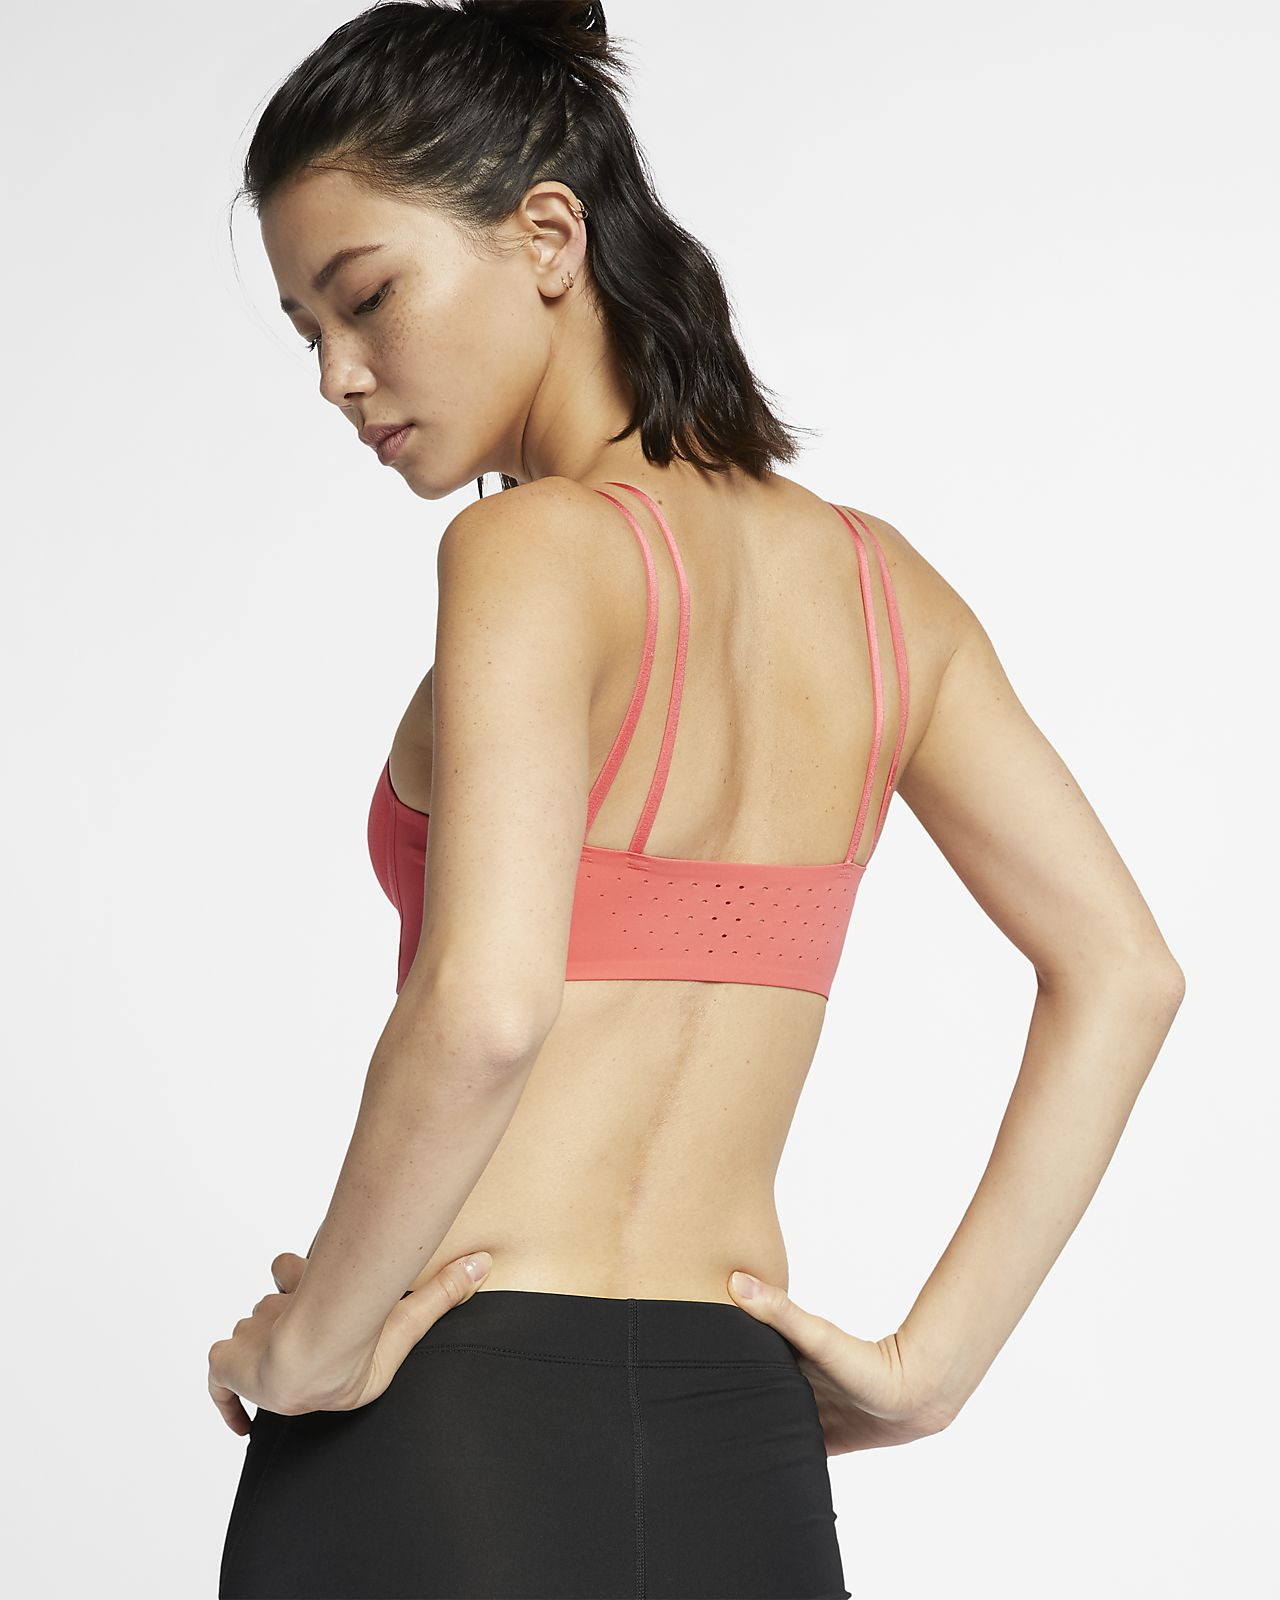 7b22e81ce8208 Nike Indy Breathe Women s Light Support Sports Bra. Nike.com IE